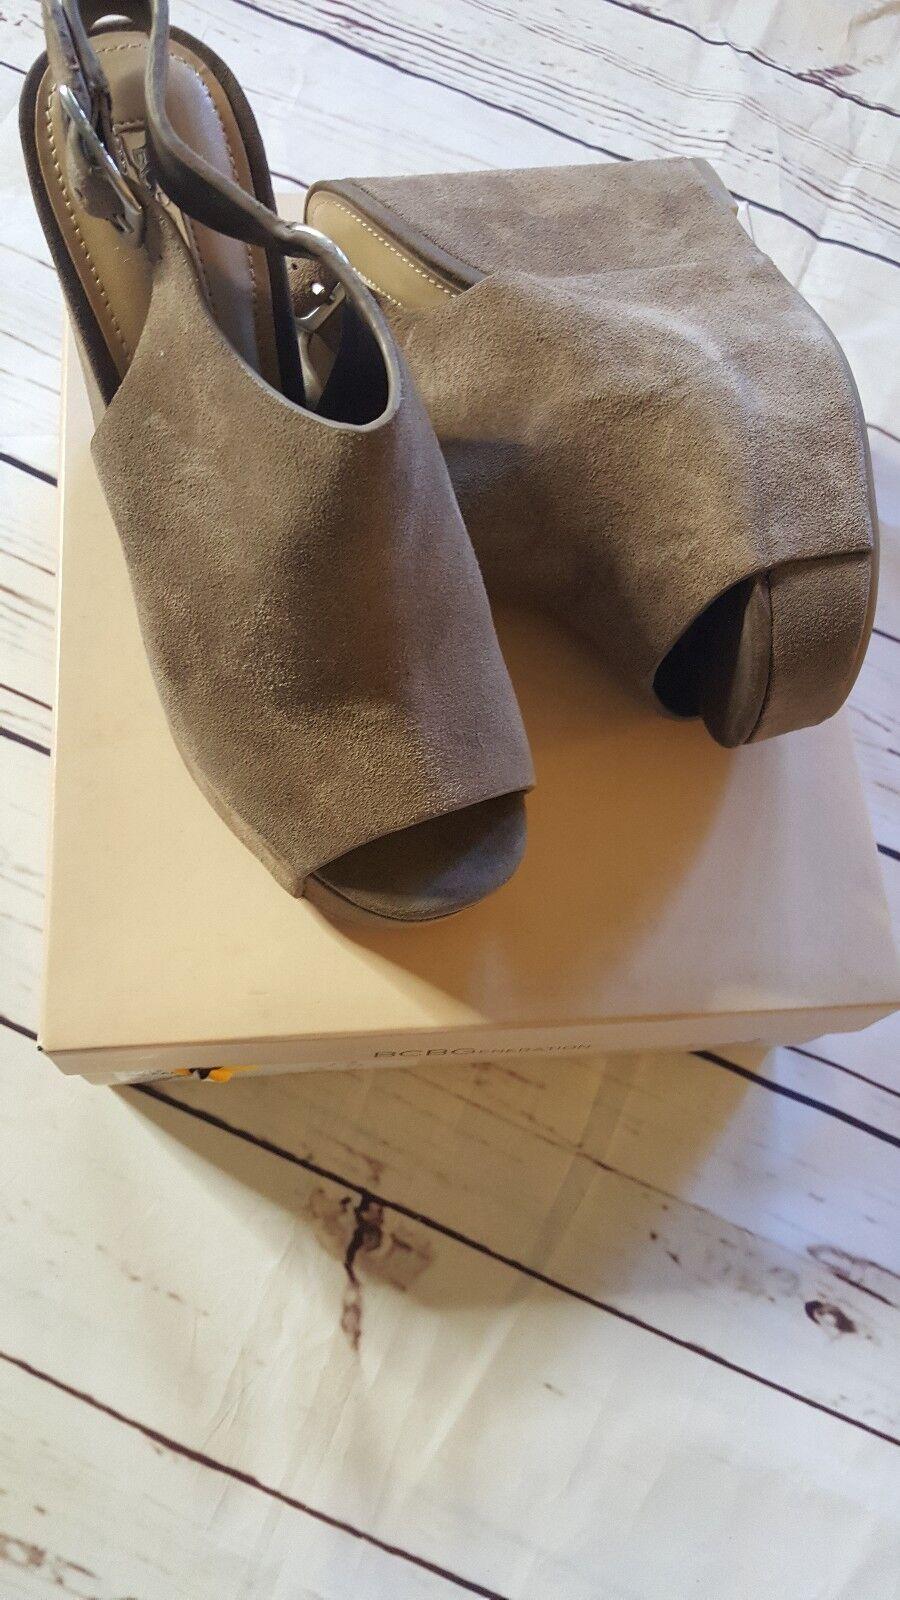 New NIB BCBG generation TAN Taupe SUEDE WEDGE PLATFORM SHOES SIZE 8 heels